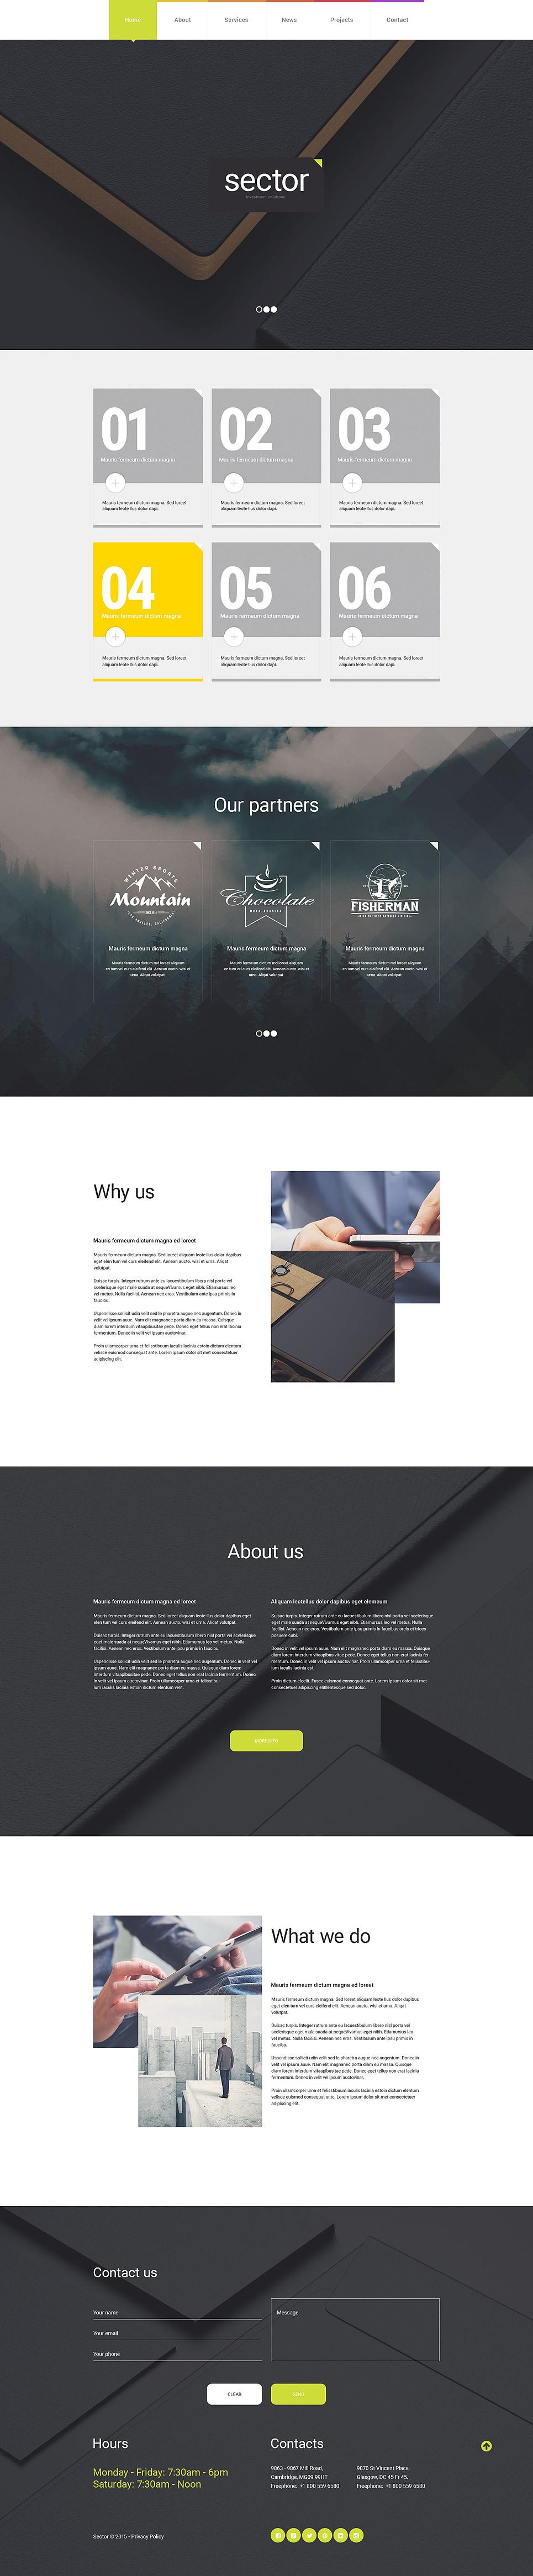 Адаптивный шаблон сайта на тему бизнес и услуги #54579